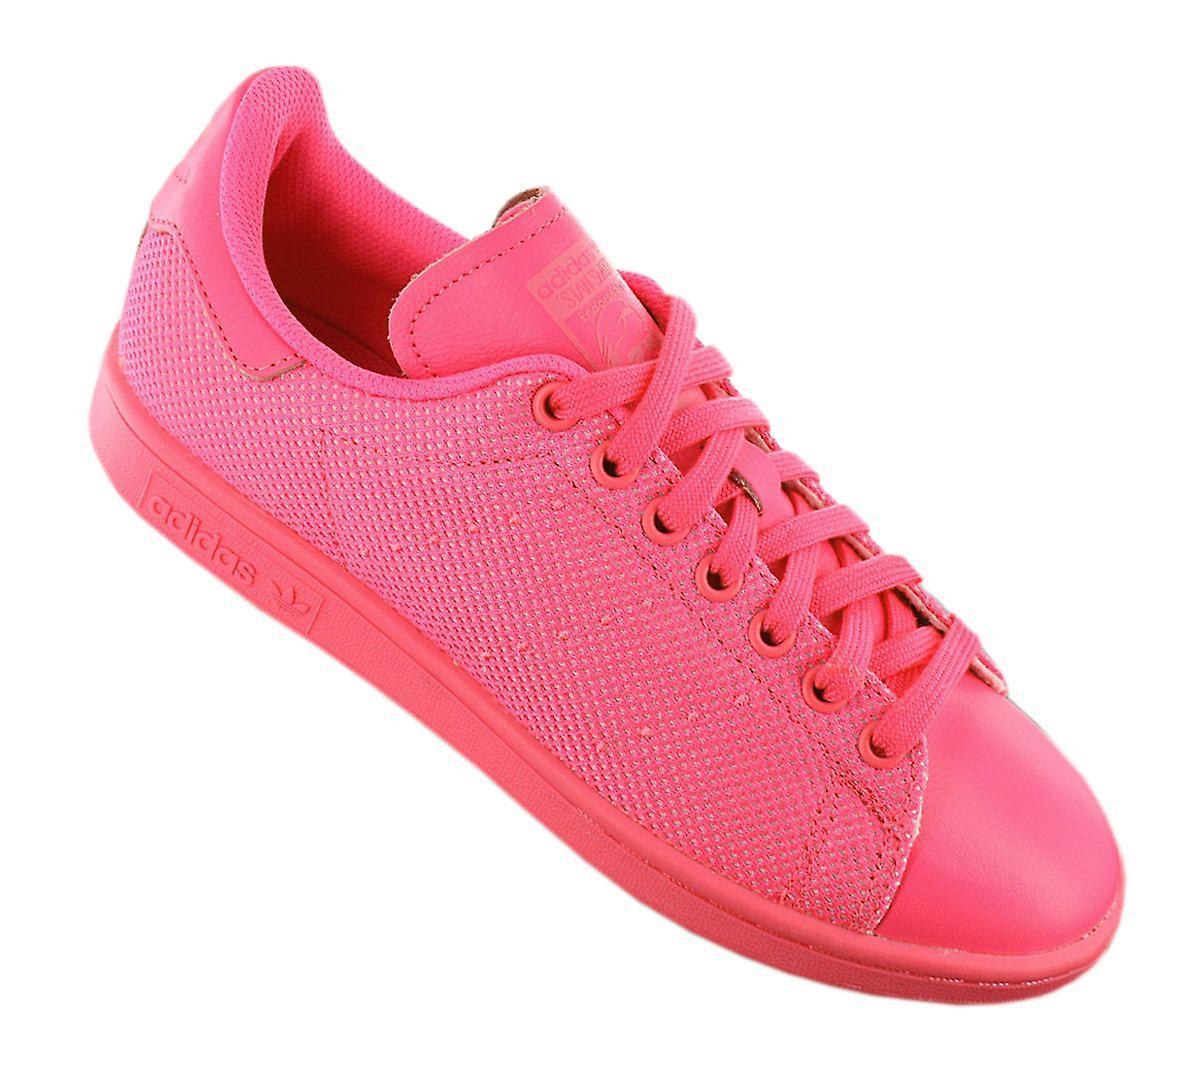 Adidas Originals Stan Smith - Damen Schuhe Pink Bb4997 Sneakers Sportschuhe